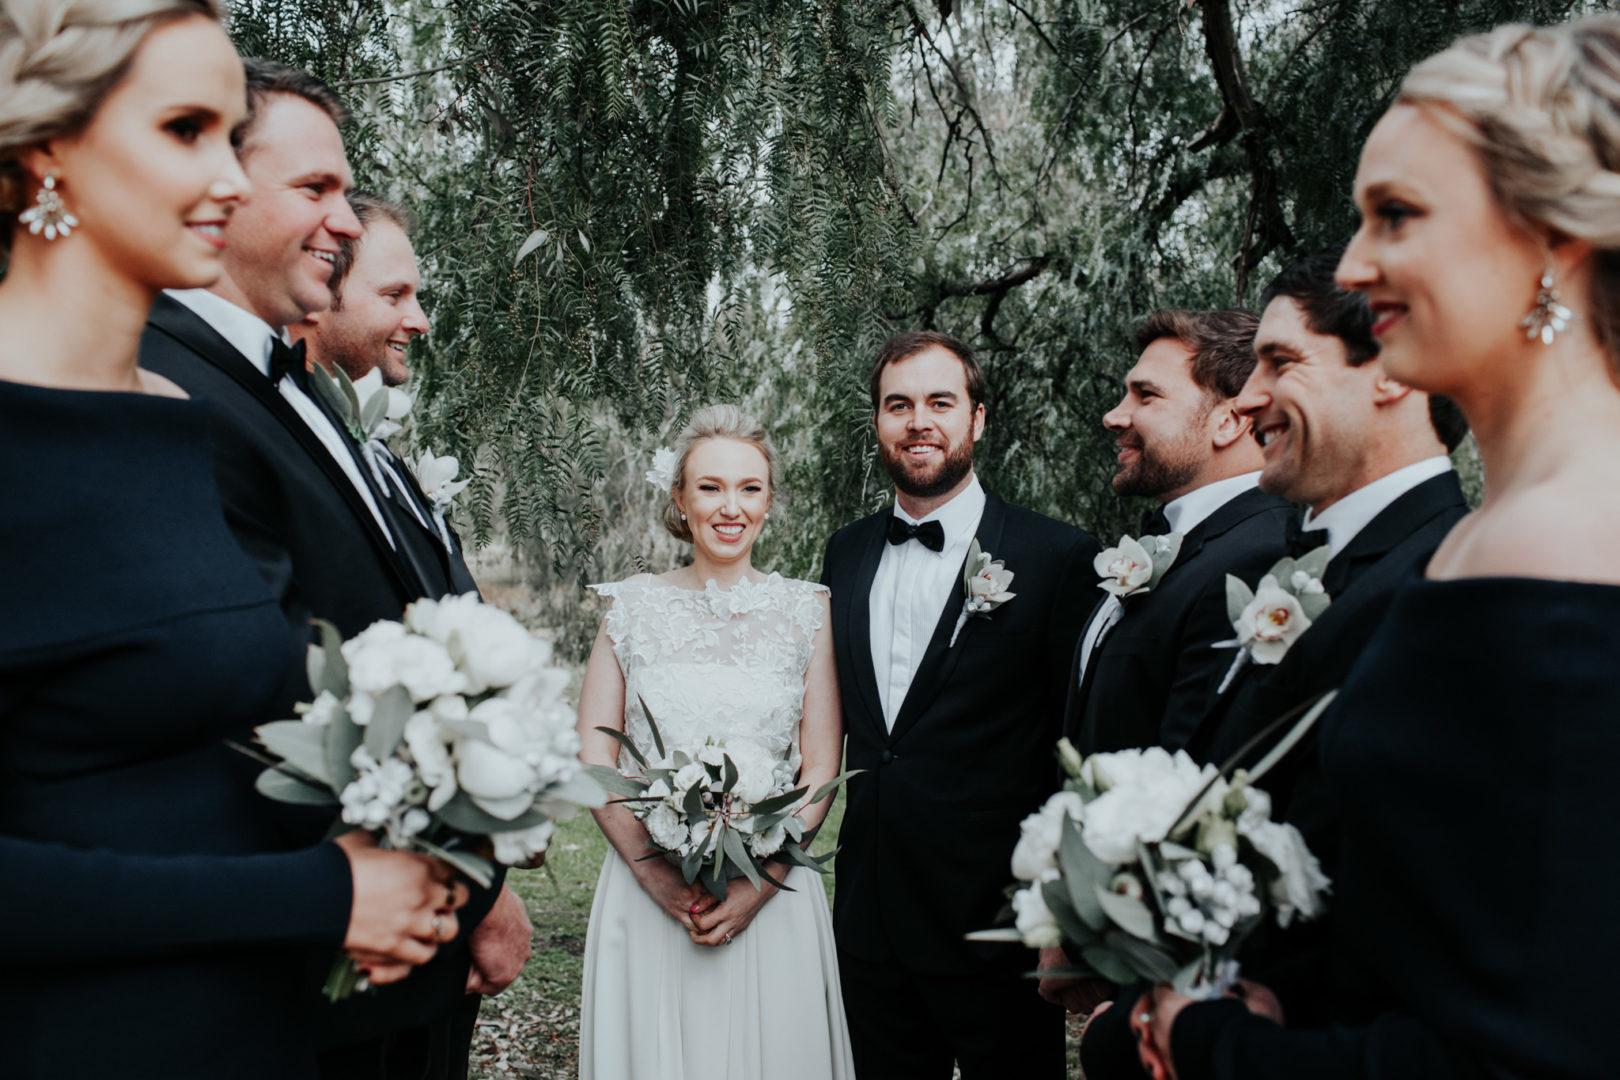 Brierfield wedding dress